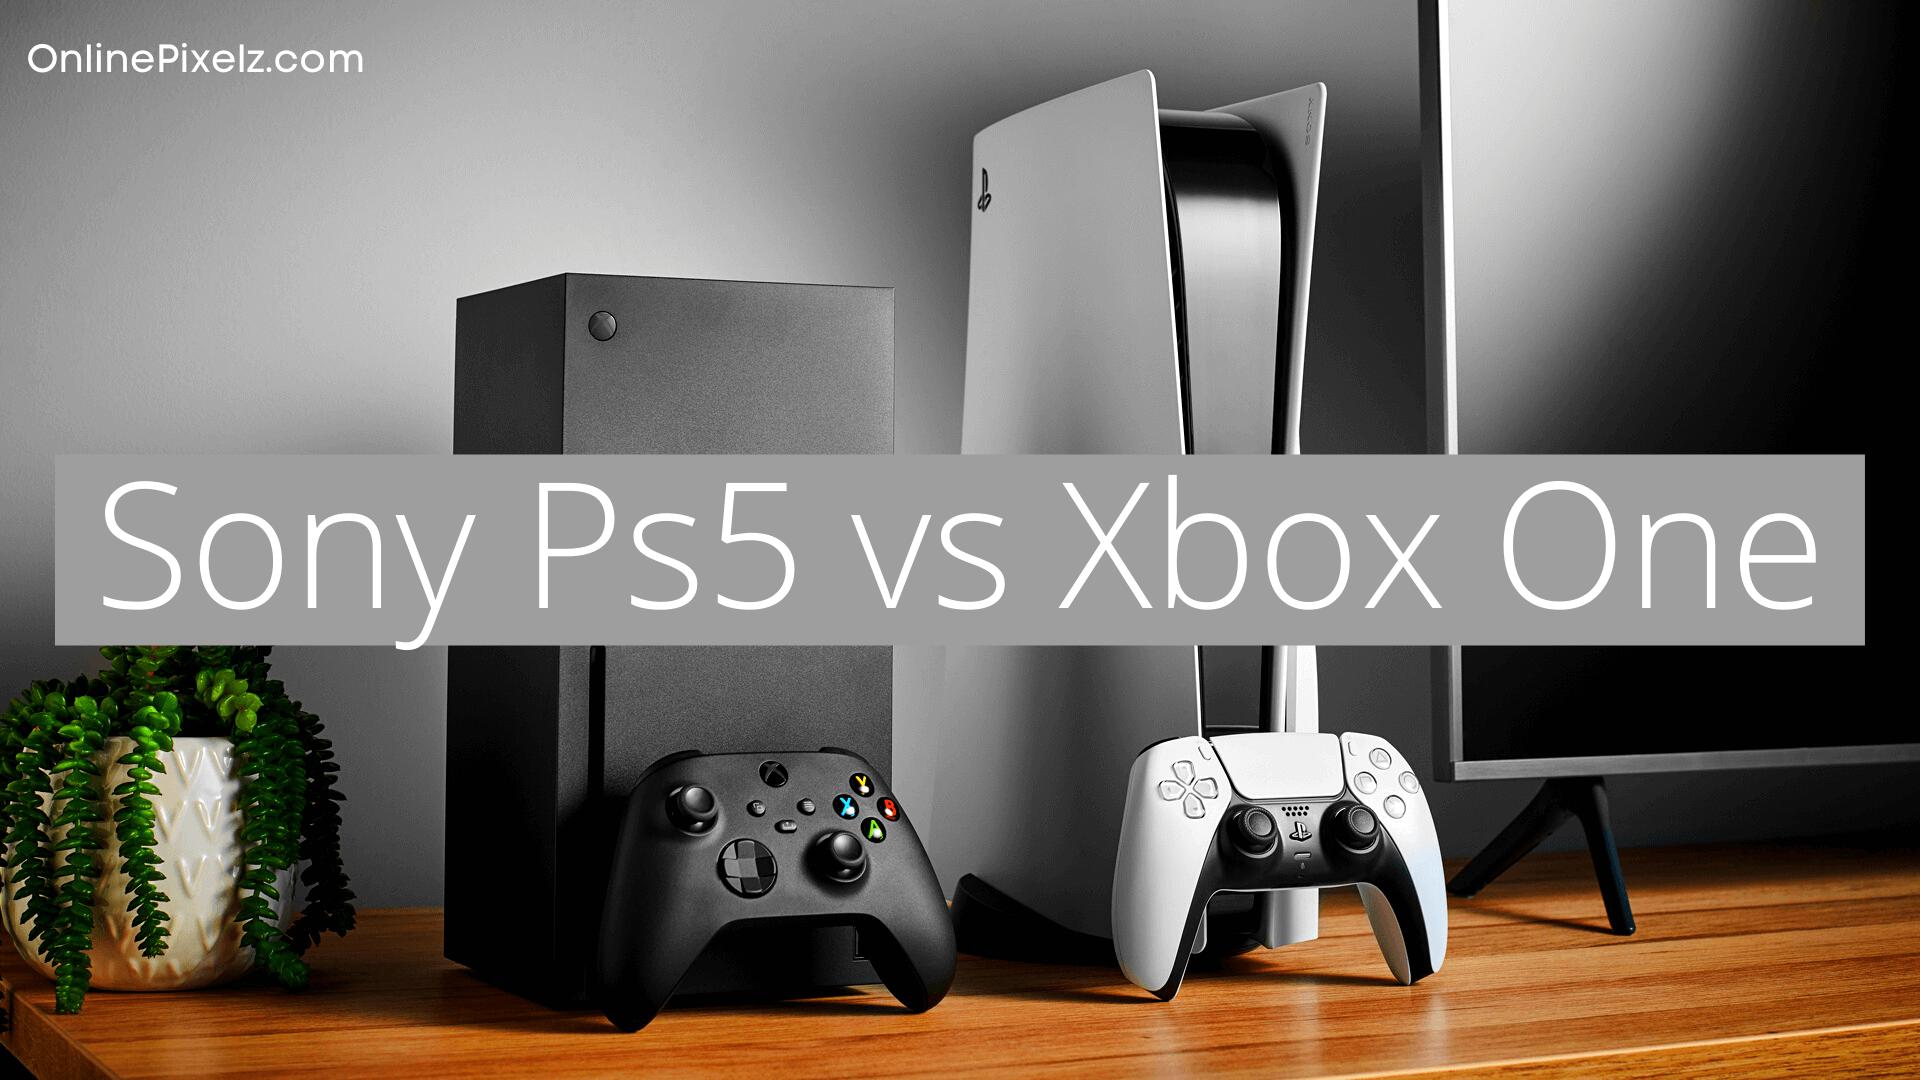 Sony Ps5 vs Xbox One